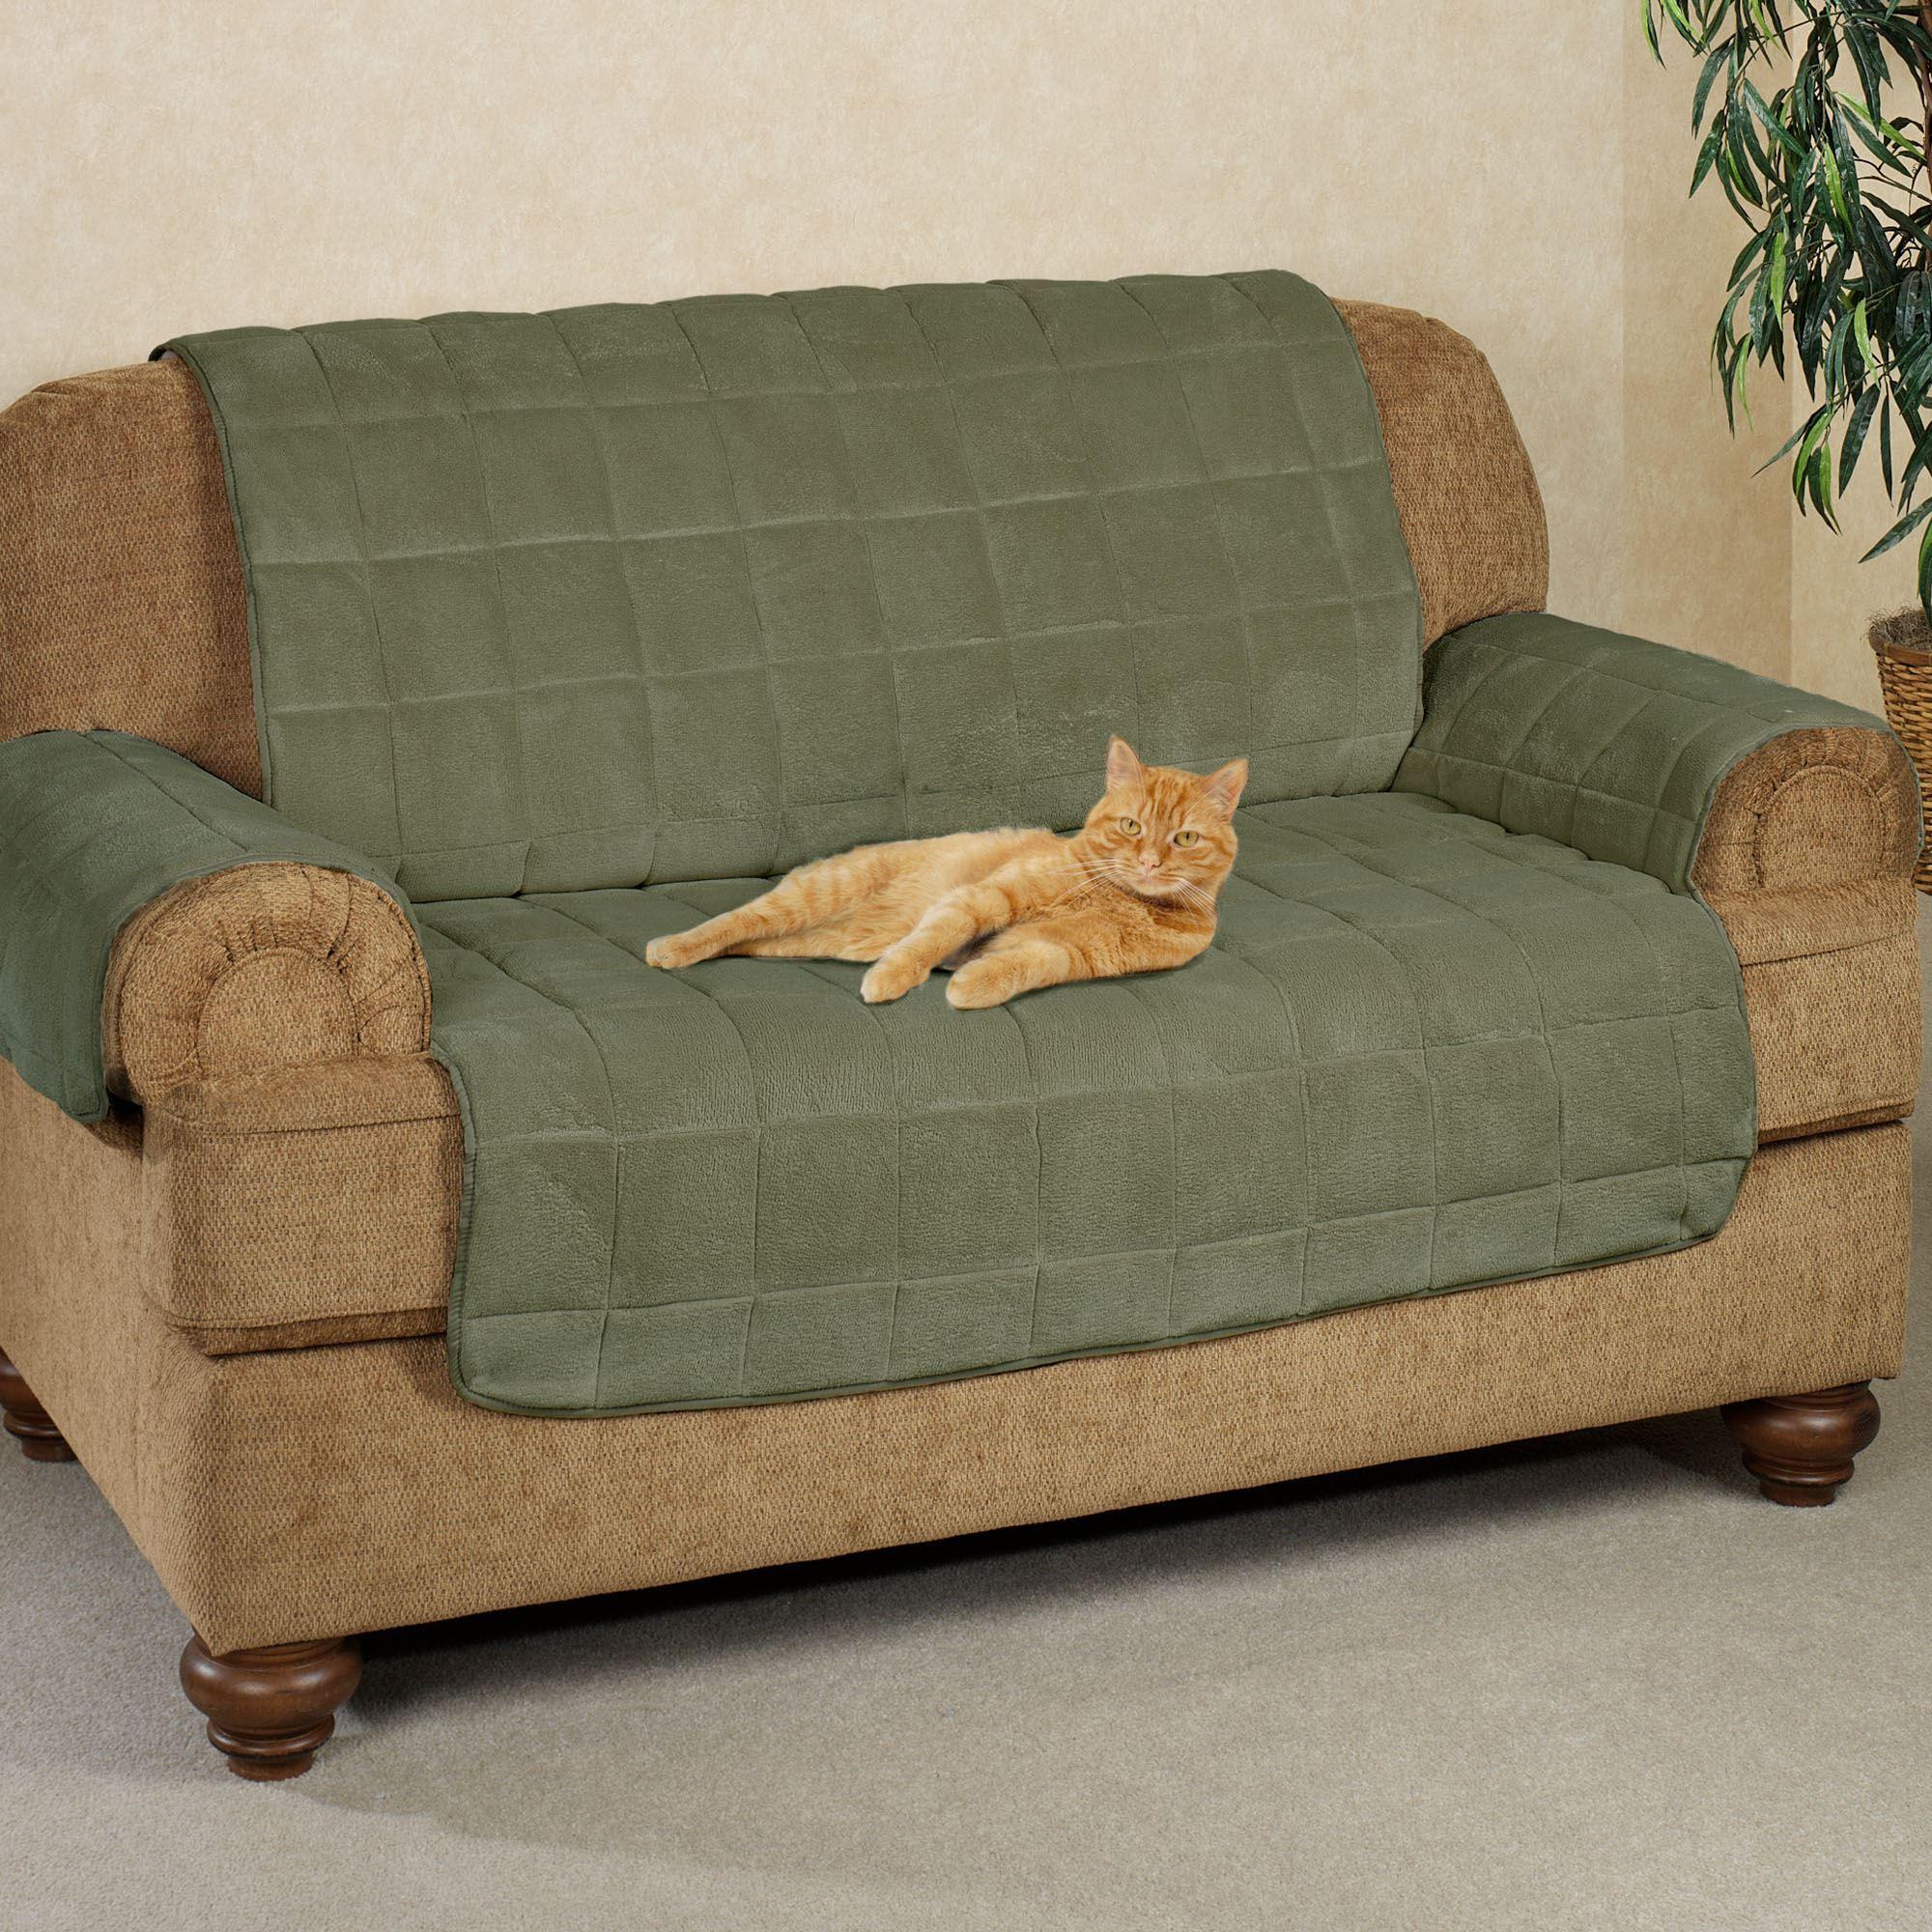 Microplush Pet Furniture Loveseat Cover